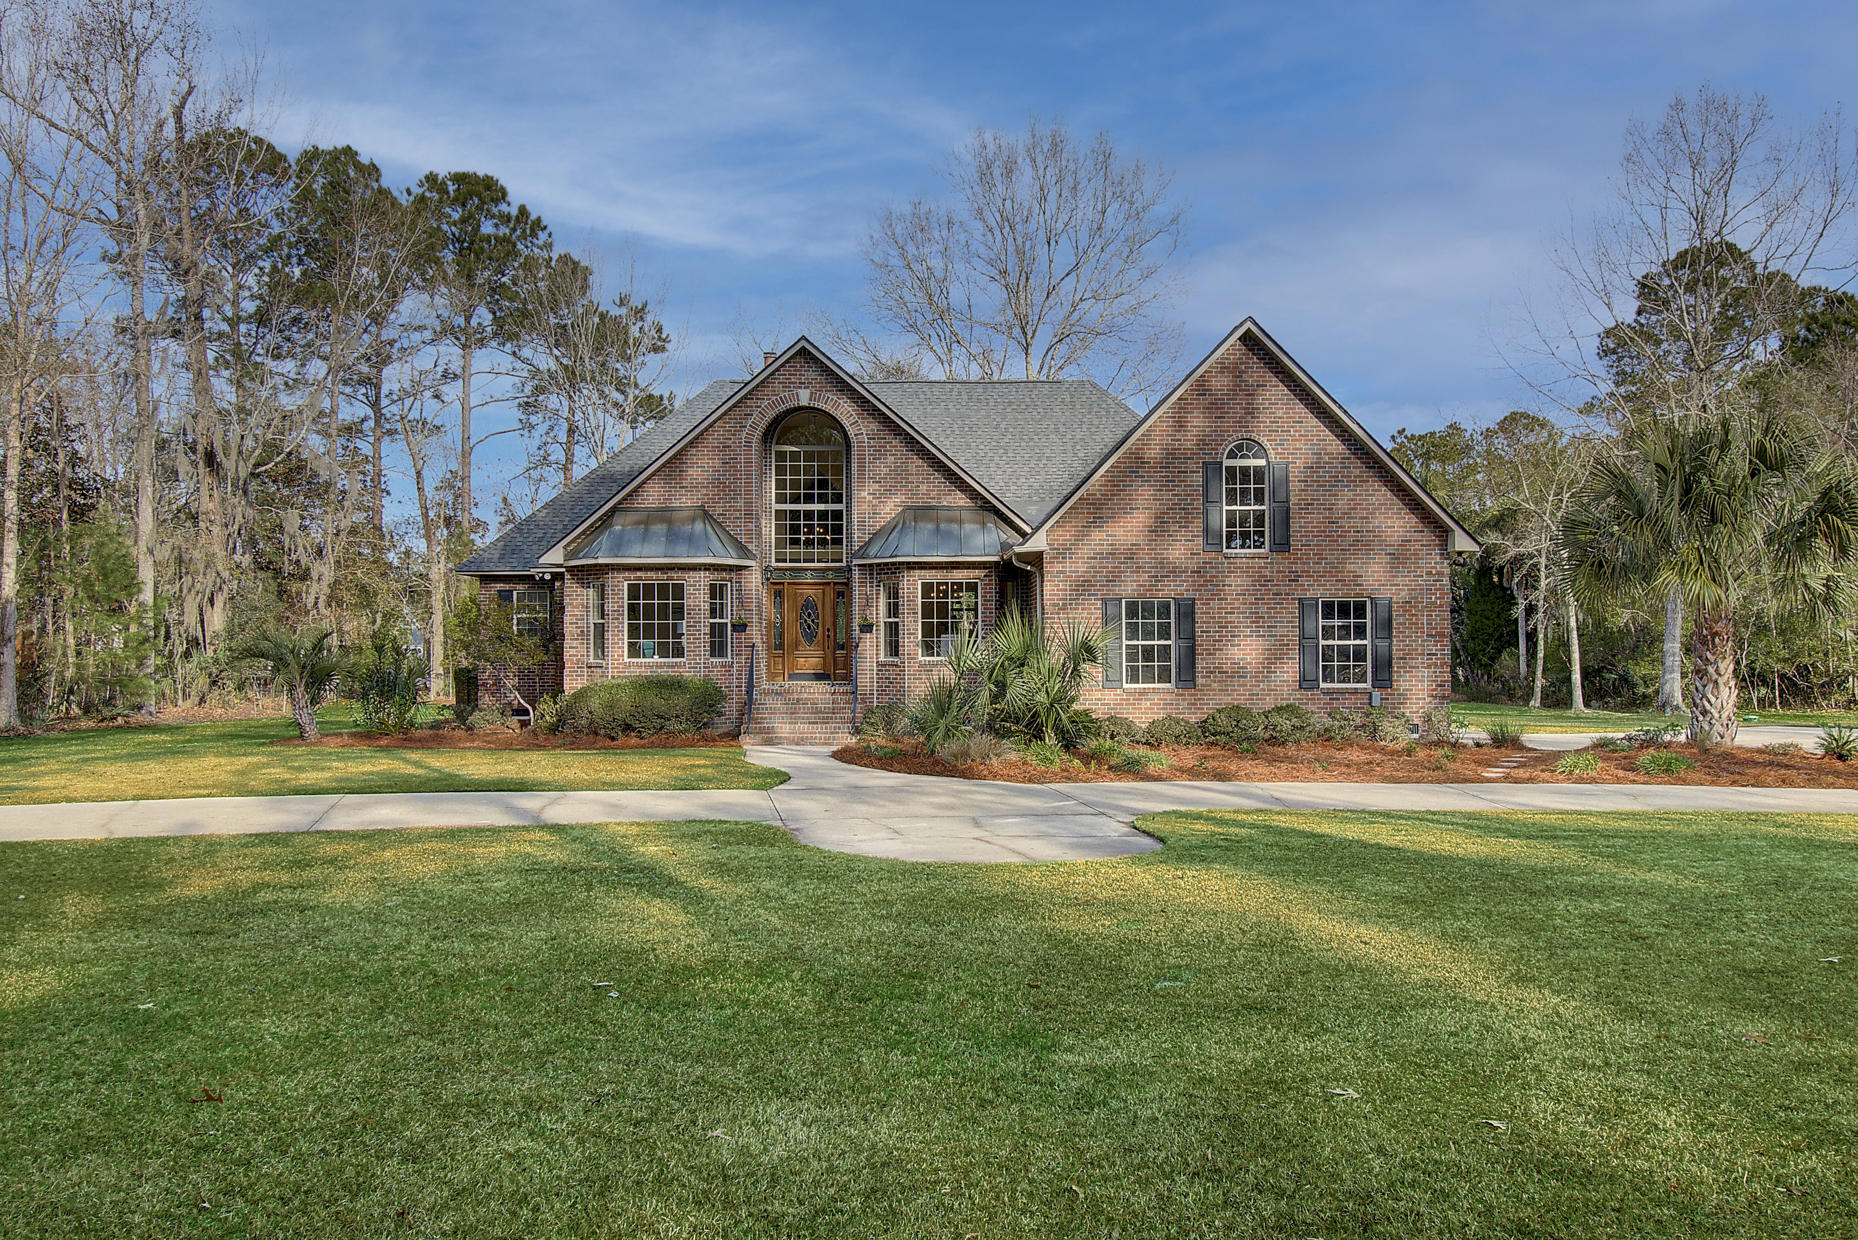 Dunes West Homes For Sale - 4123 Colonel Vanderhorst, Mount Pleasant, SC - 29